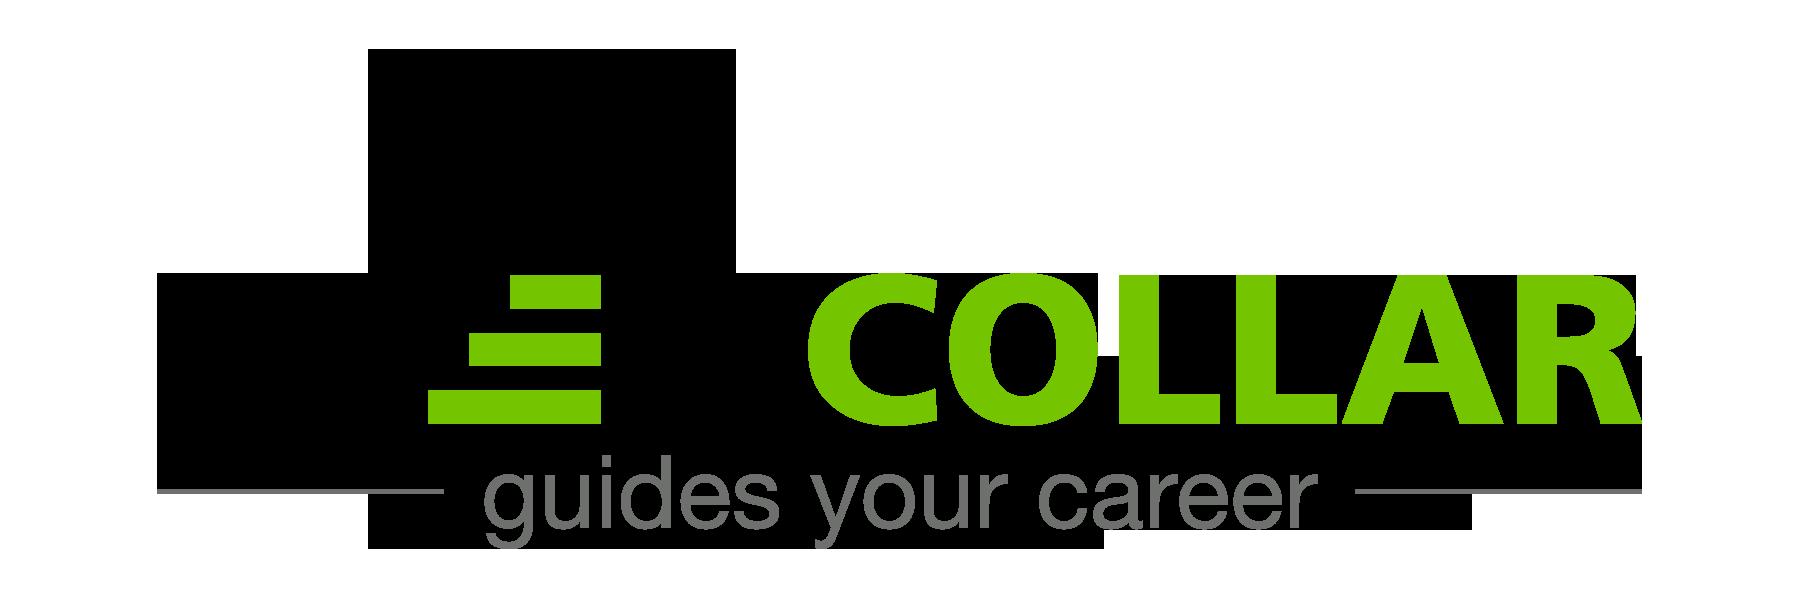 logo open collar - online programma